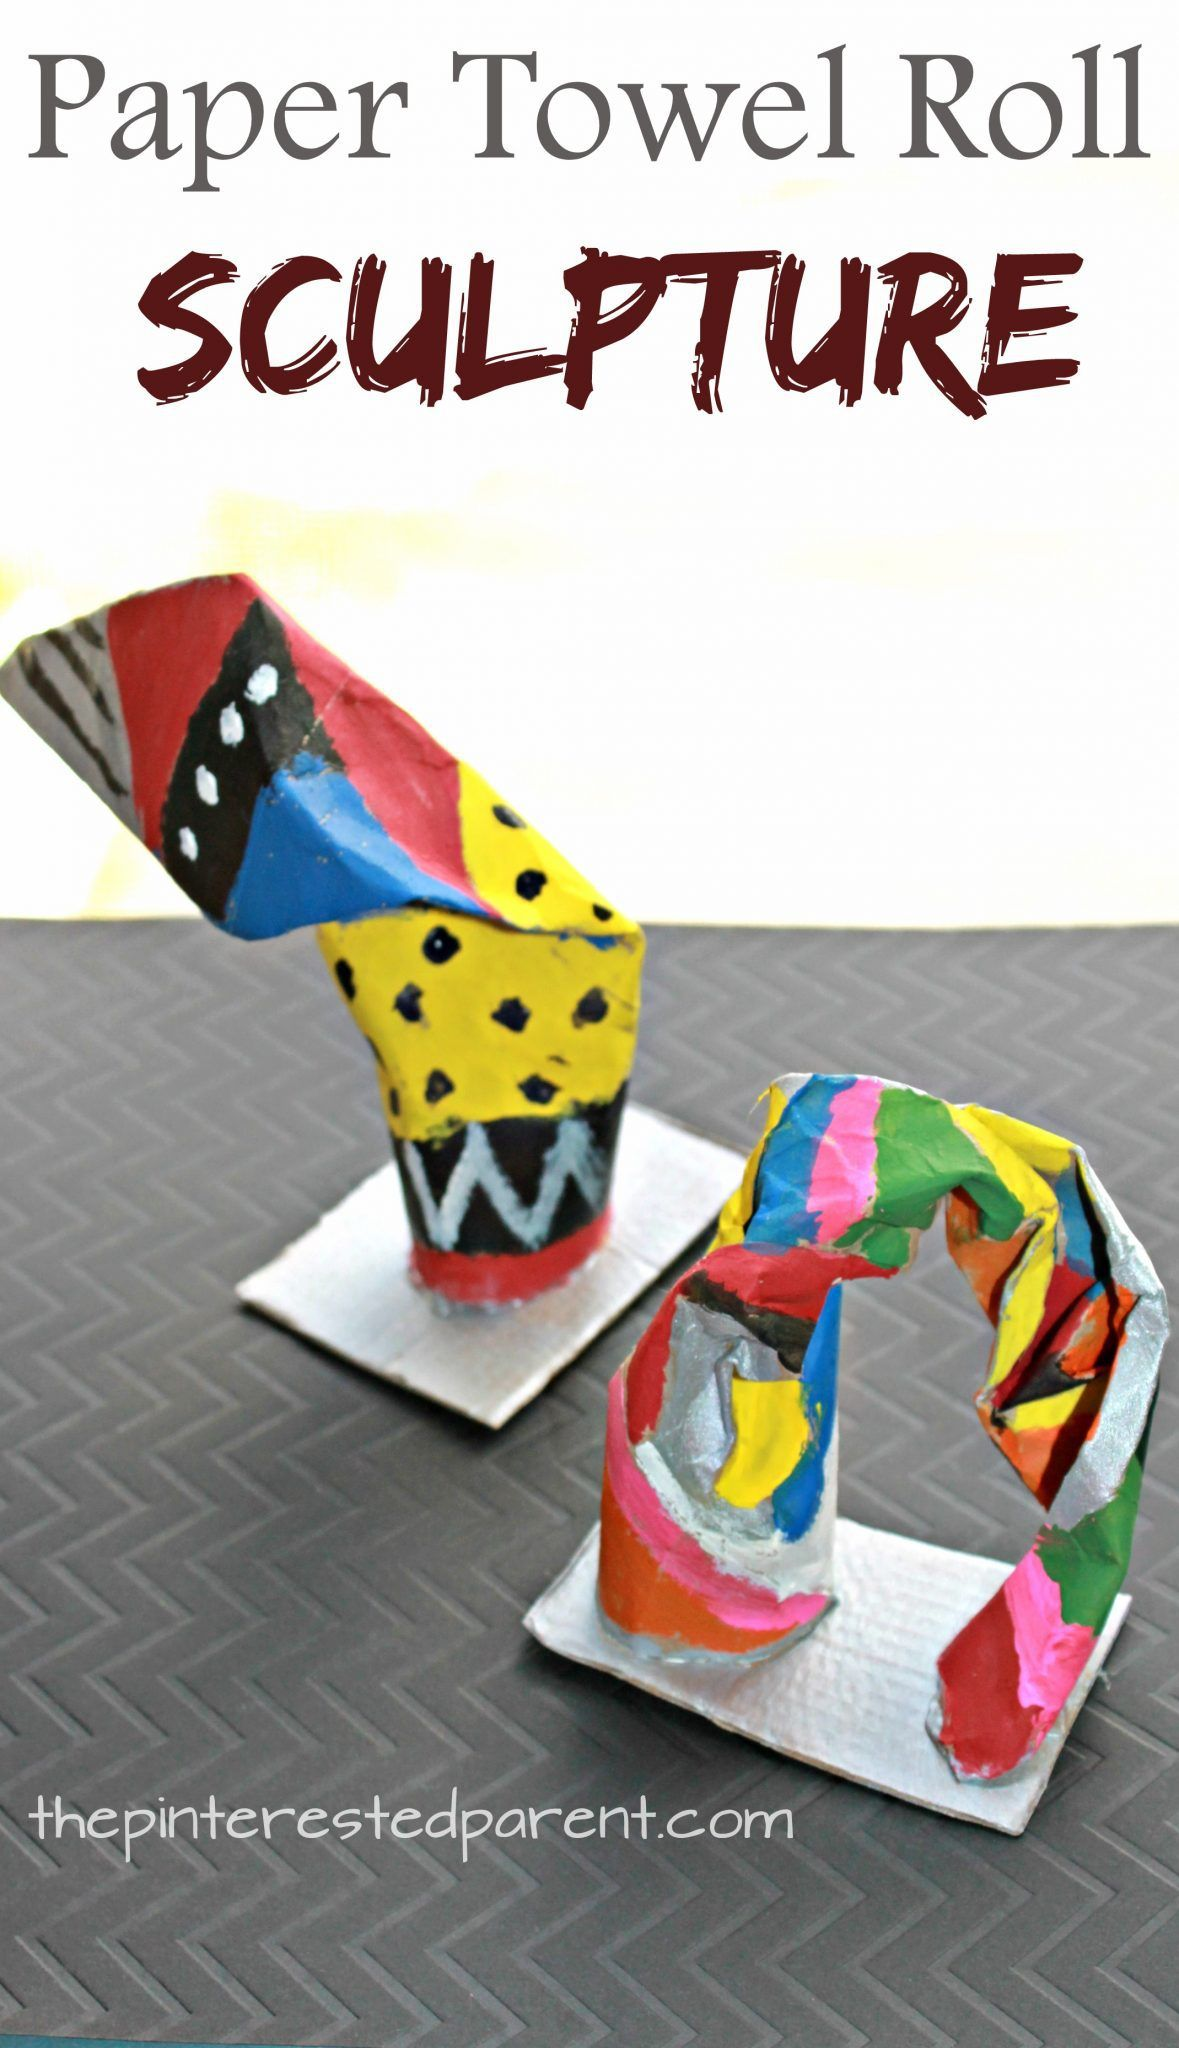 Paper Towel Roll Sculptures Montessori Inspired Activities And